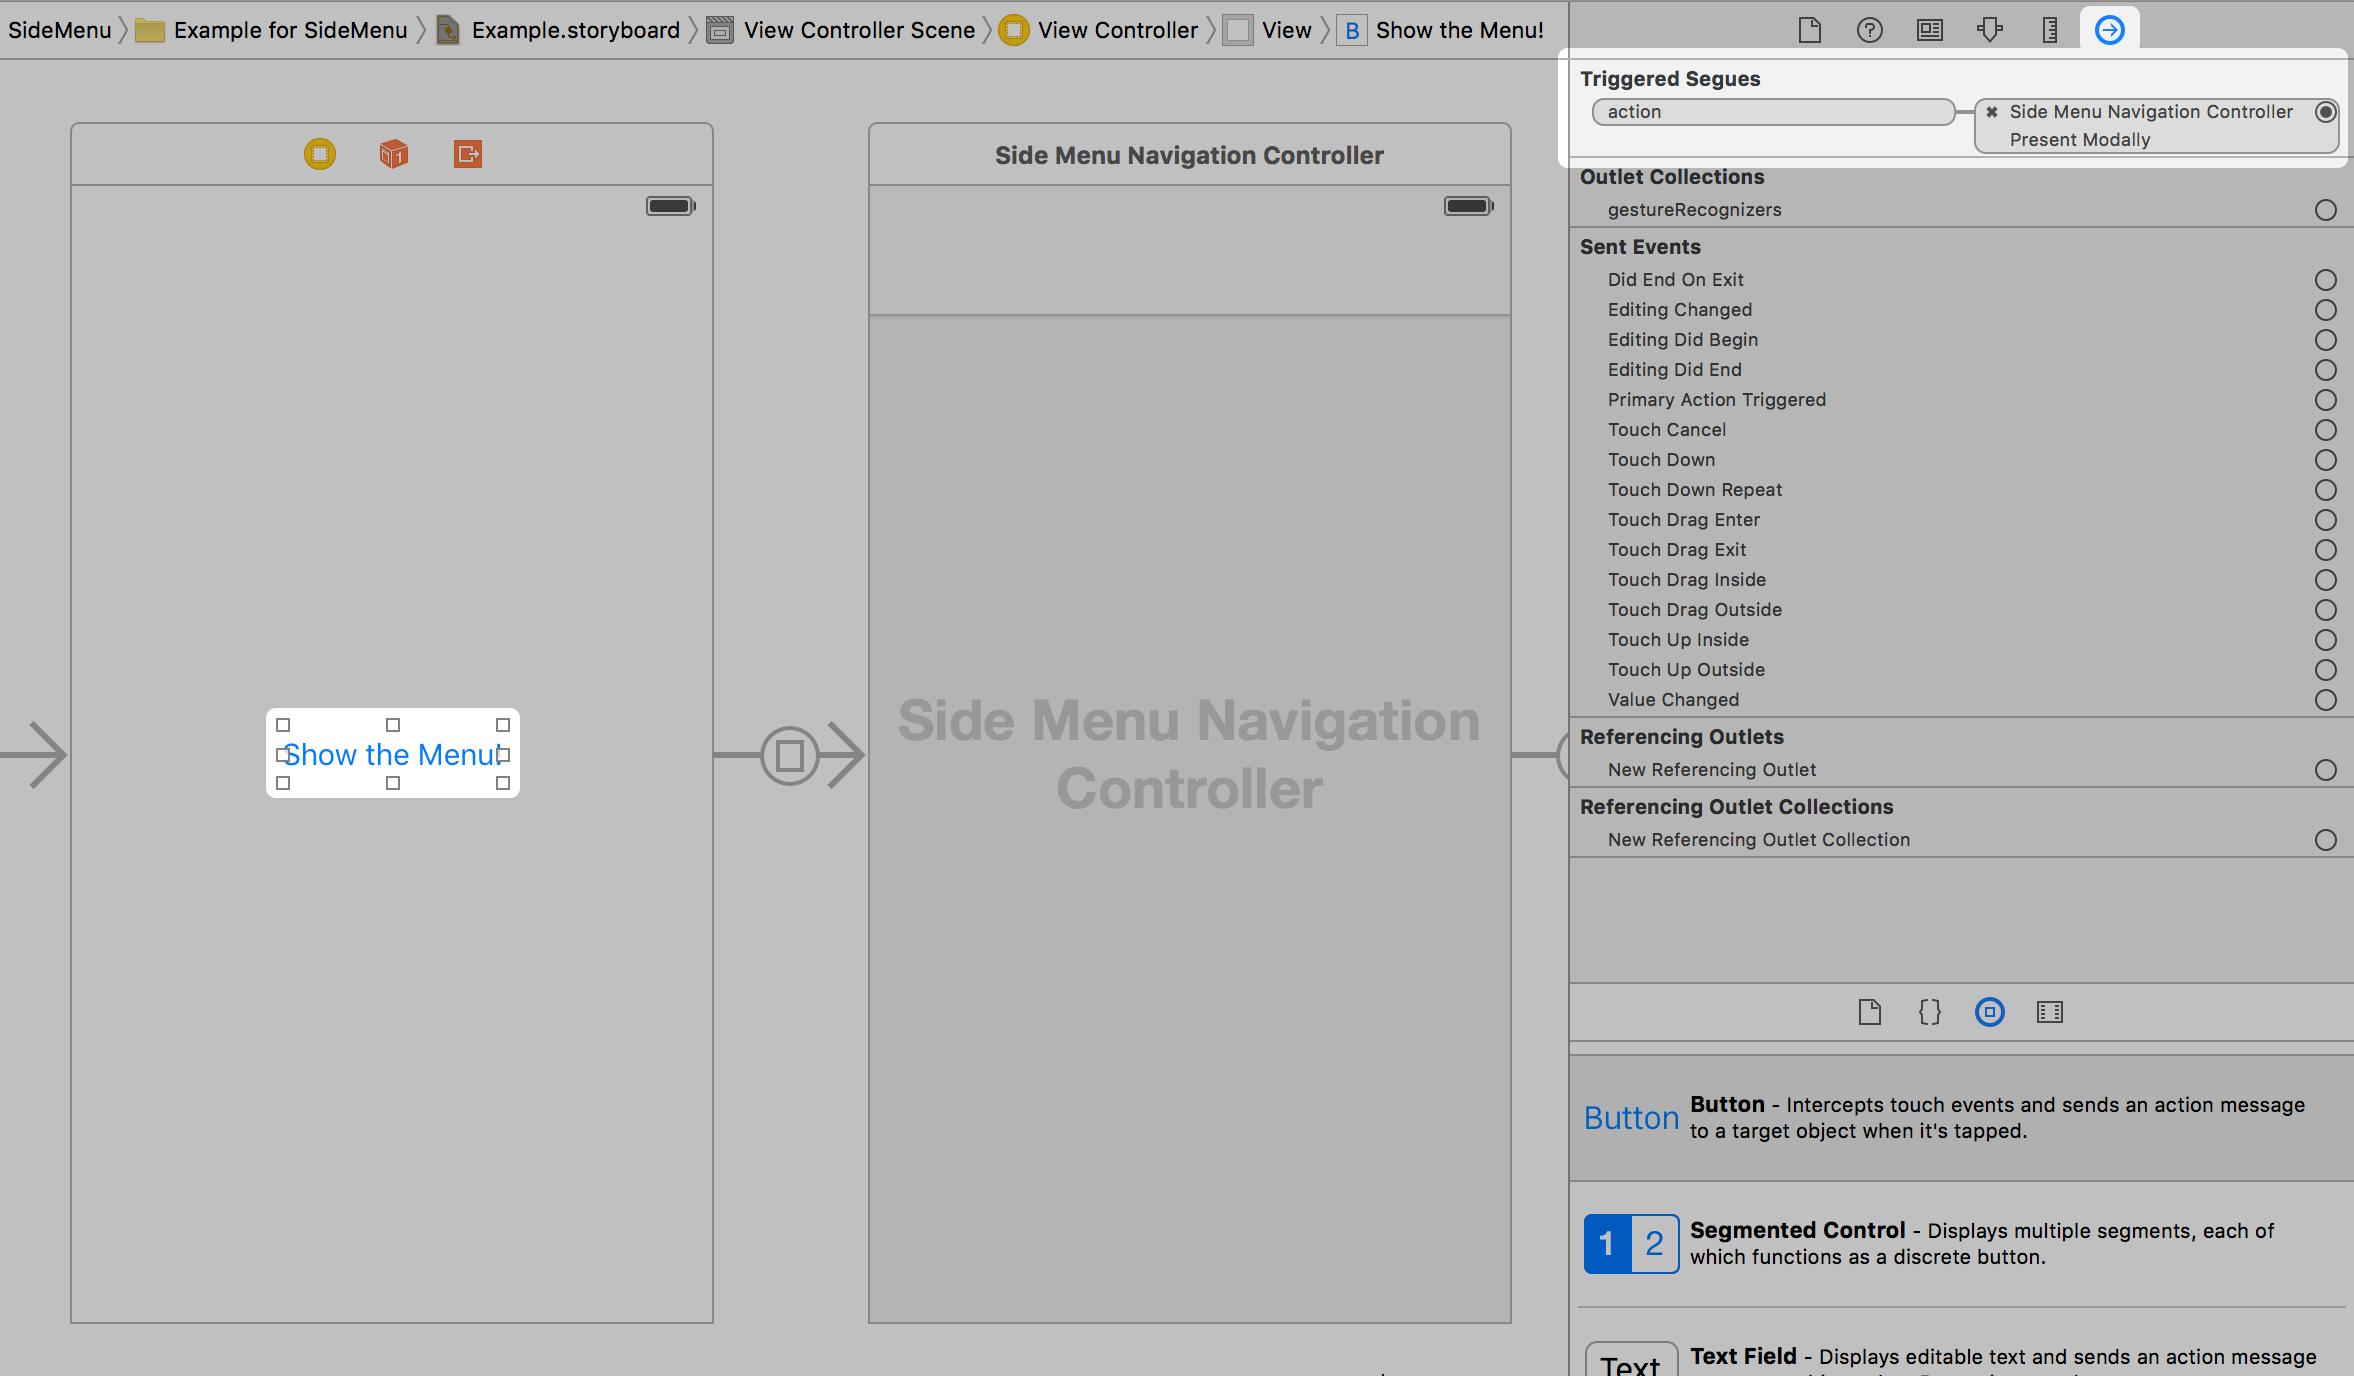 GitHub - jonkykong/SideMenu: Simple side/slide menu control